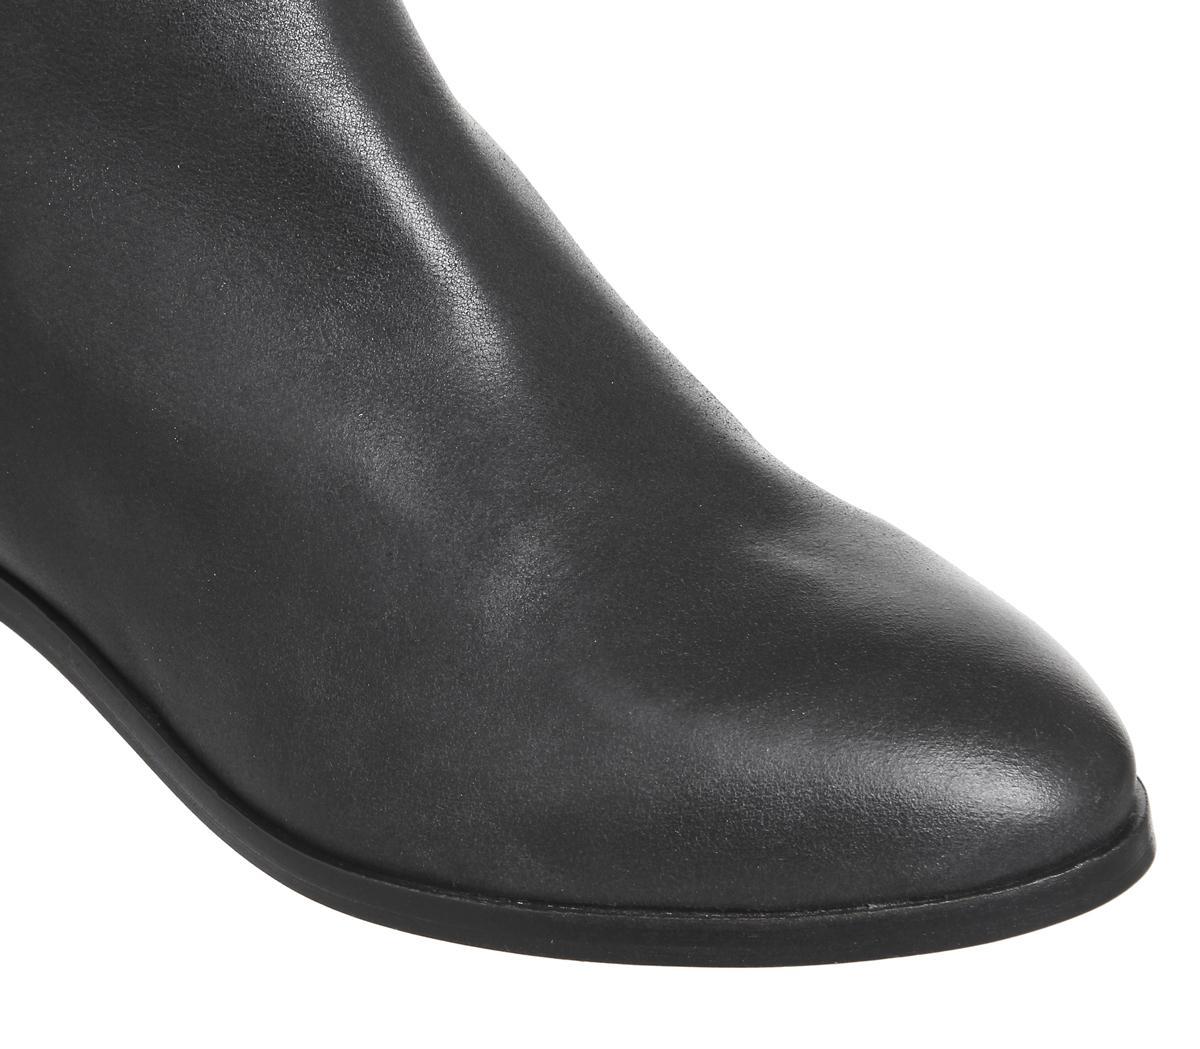 1370496742fc1 Office Alpine Flat Chelsea Boots in Black - Lyst